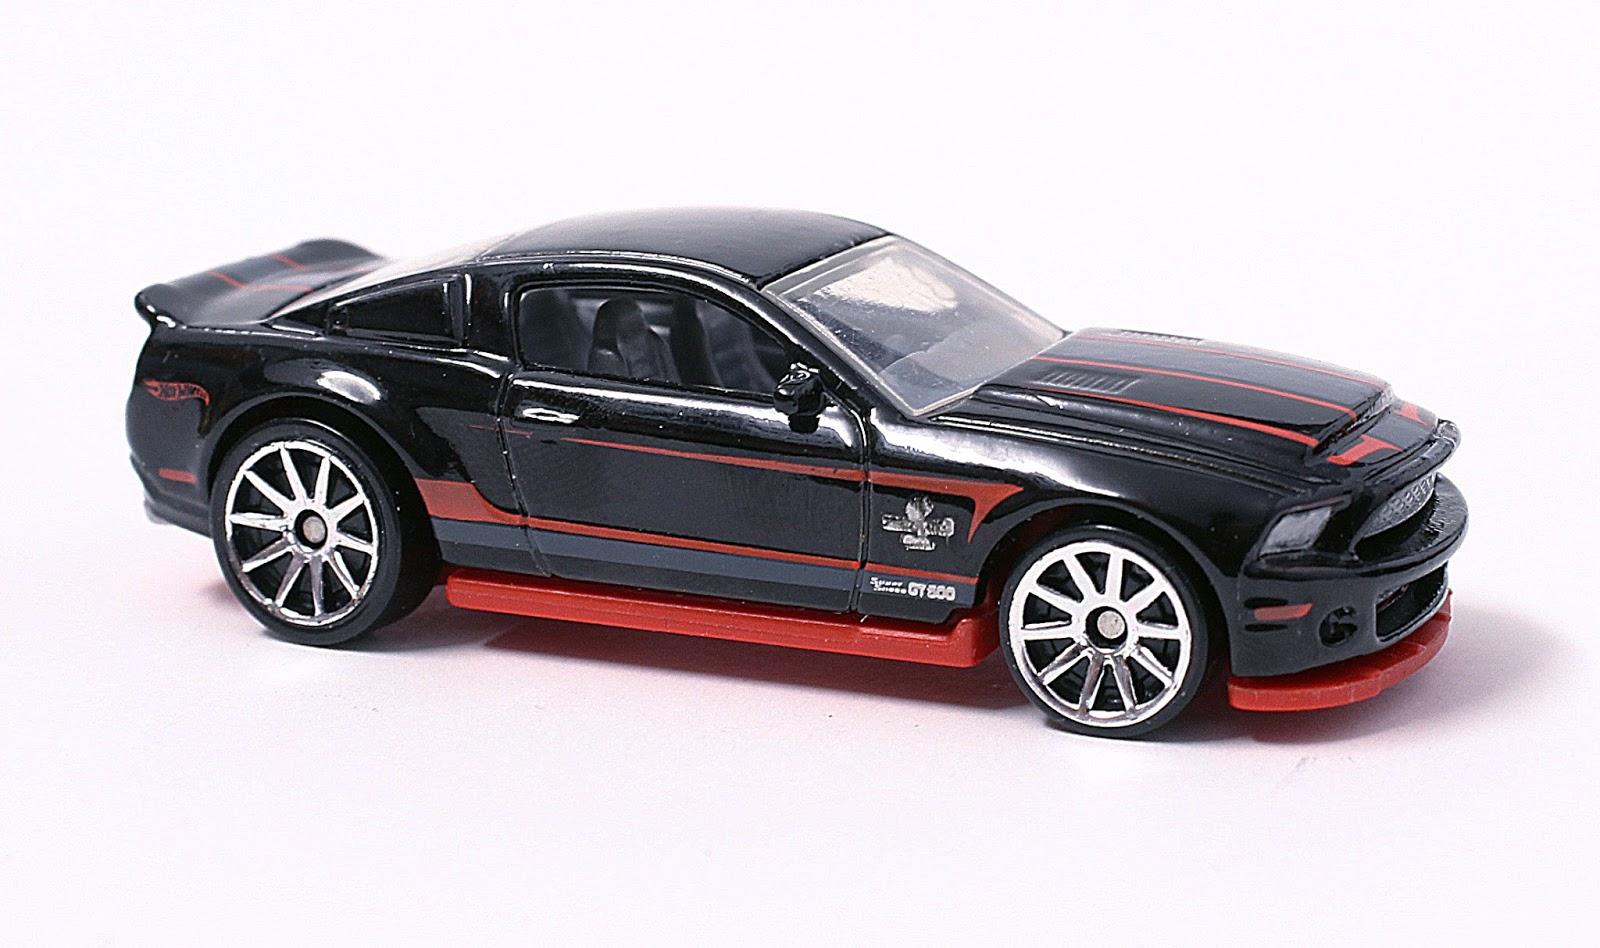 2014 Gt 500 Super Snake.html   Autos Post